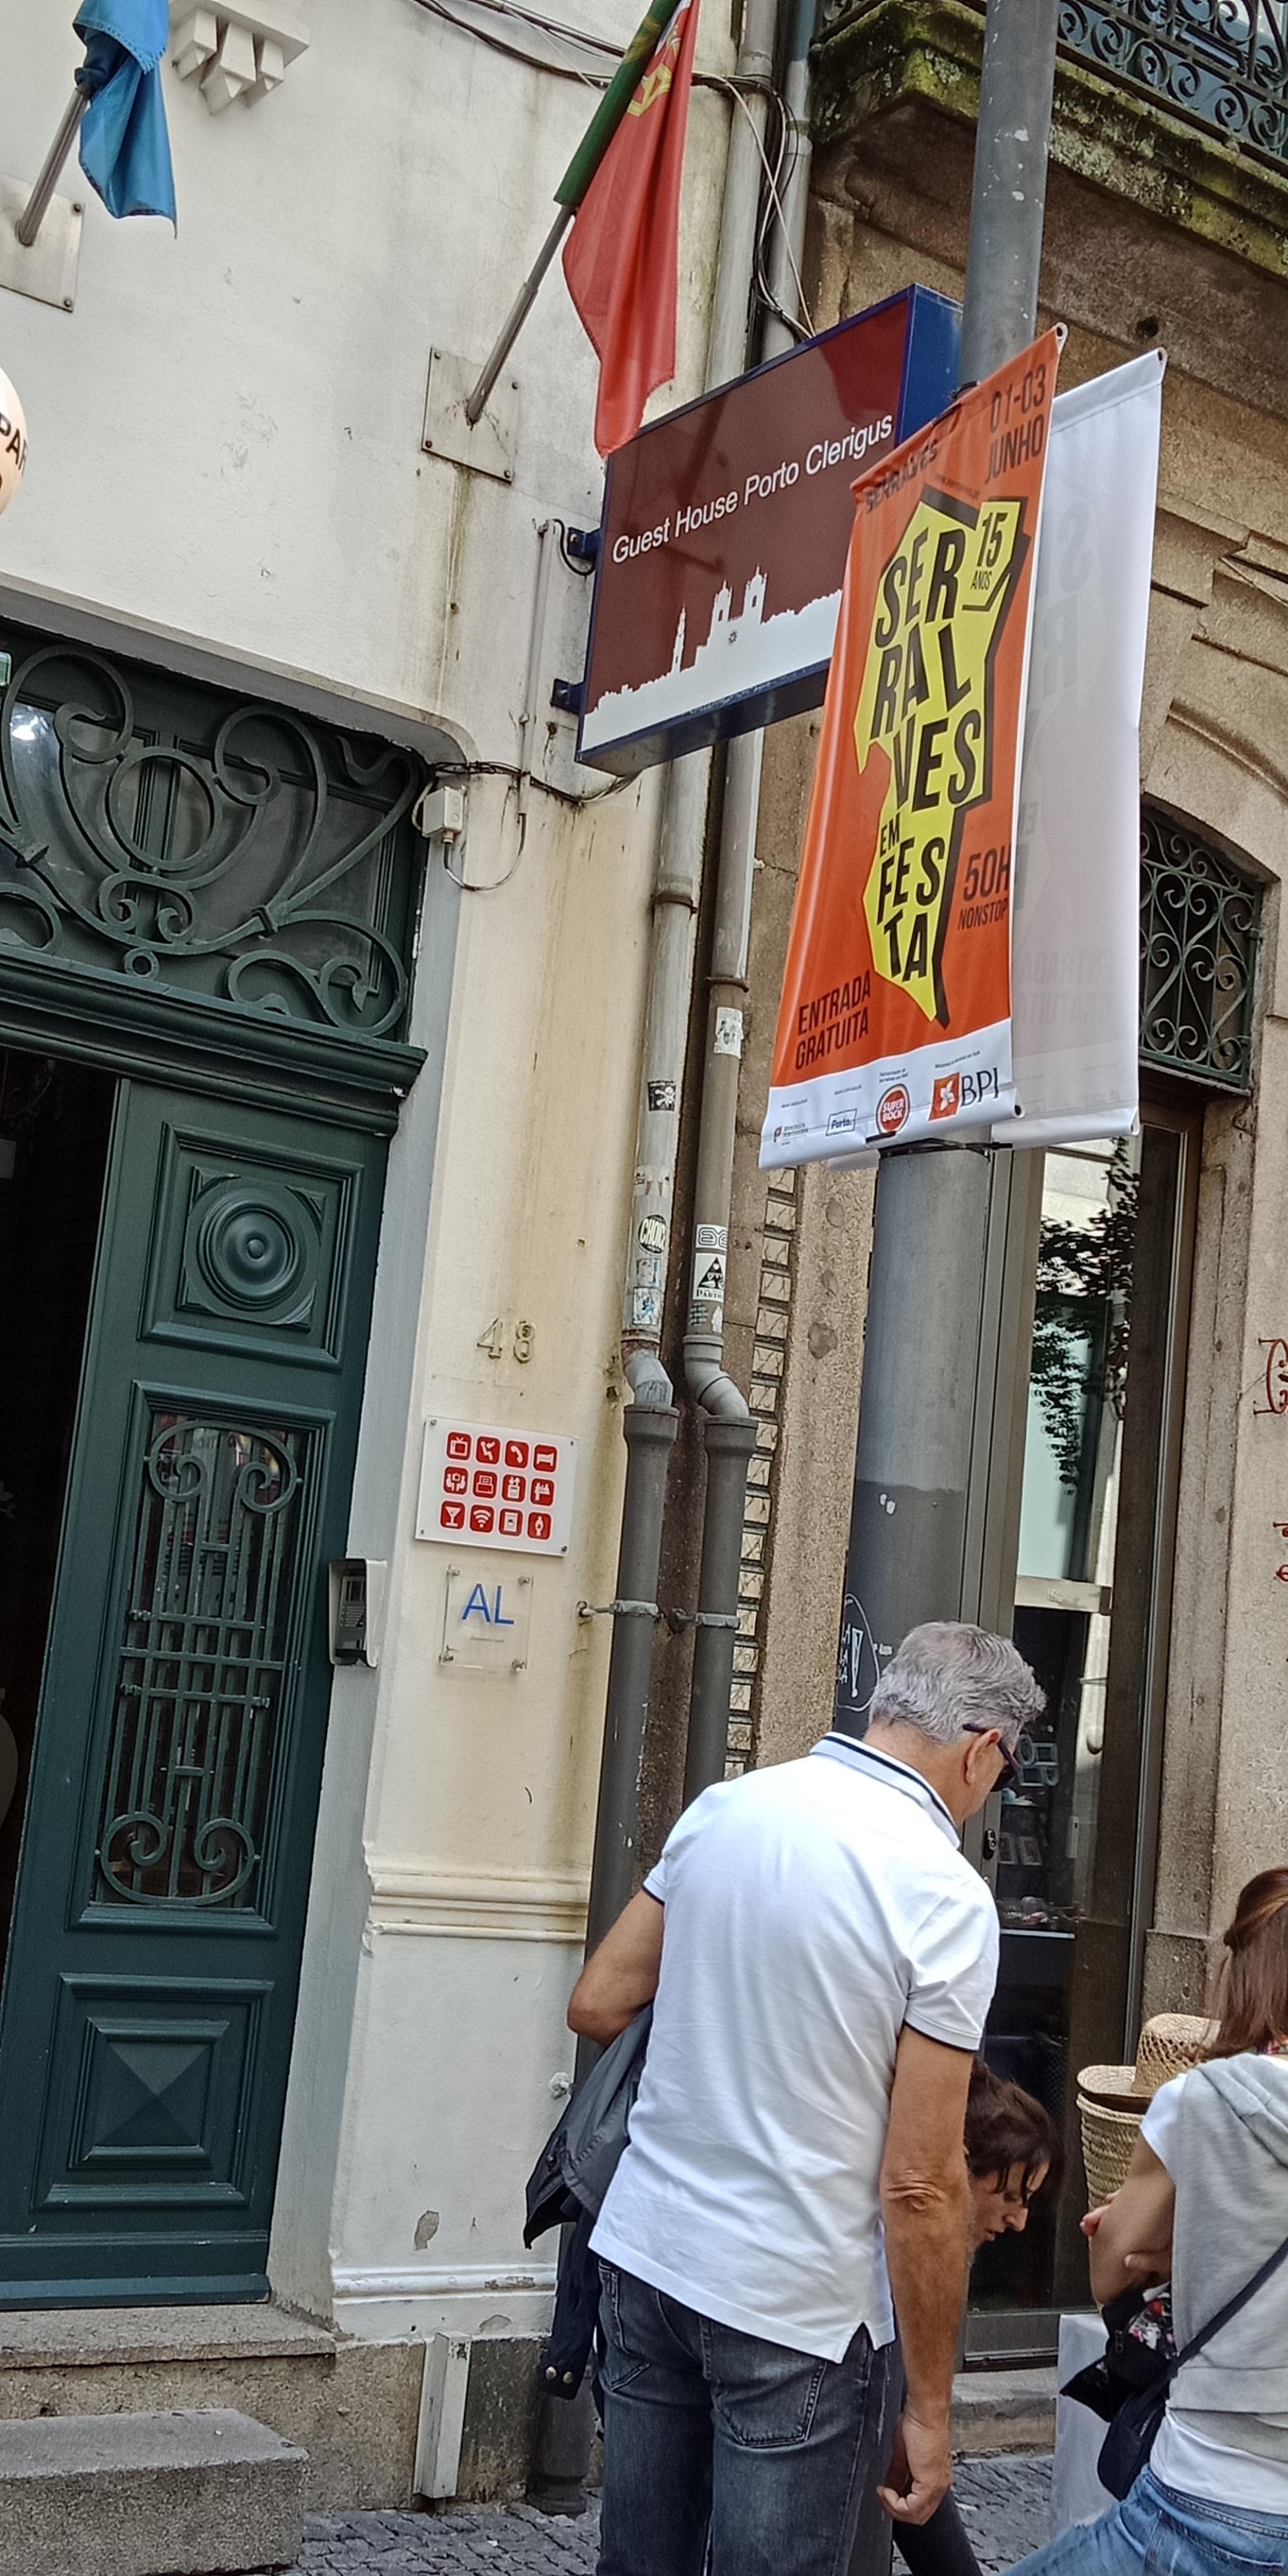 Guest House Porto Clerigus